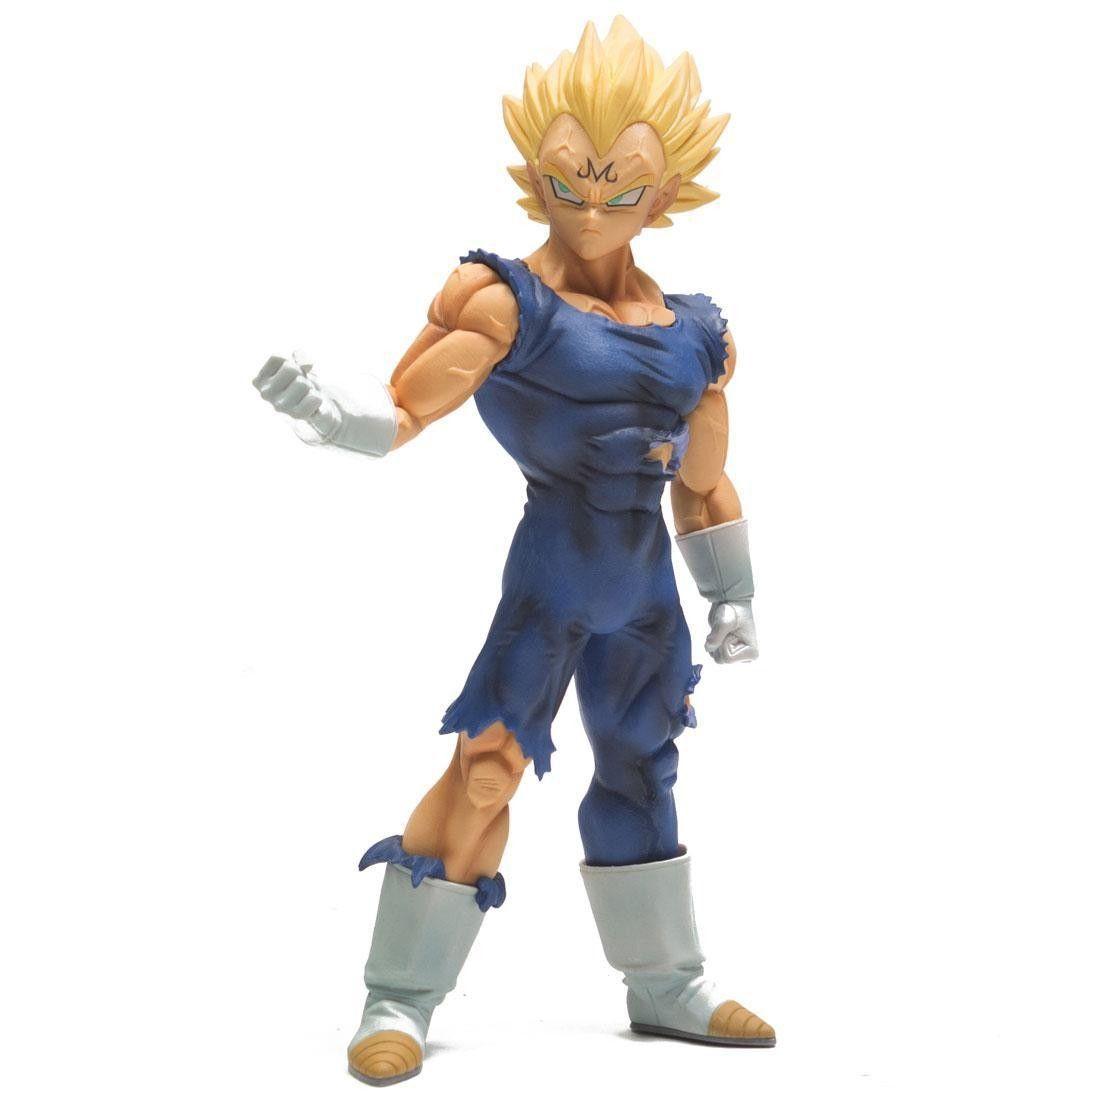 Vegeta Super Saiyajin - Bandai Banpresto - Dragon Ball Super Legend Battle